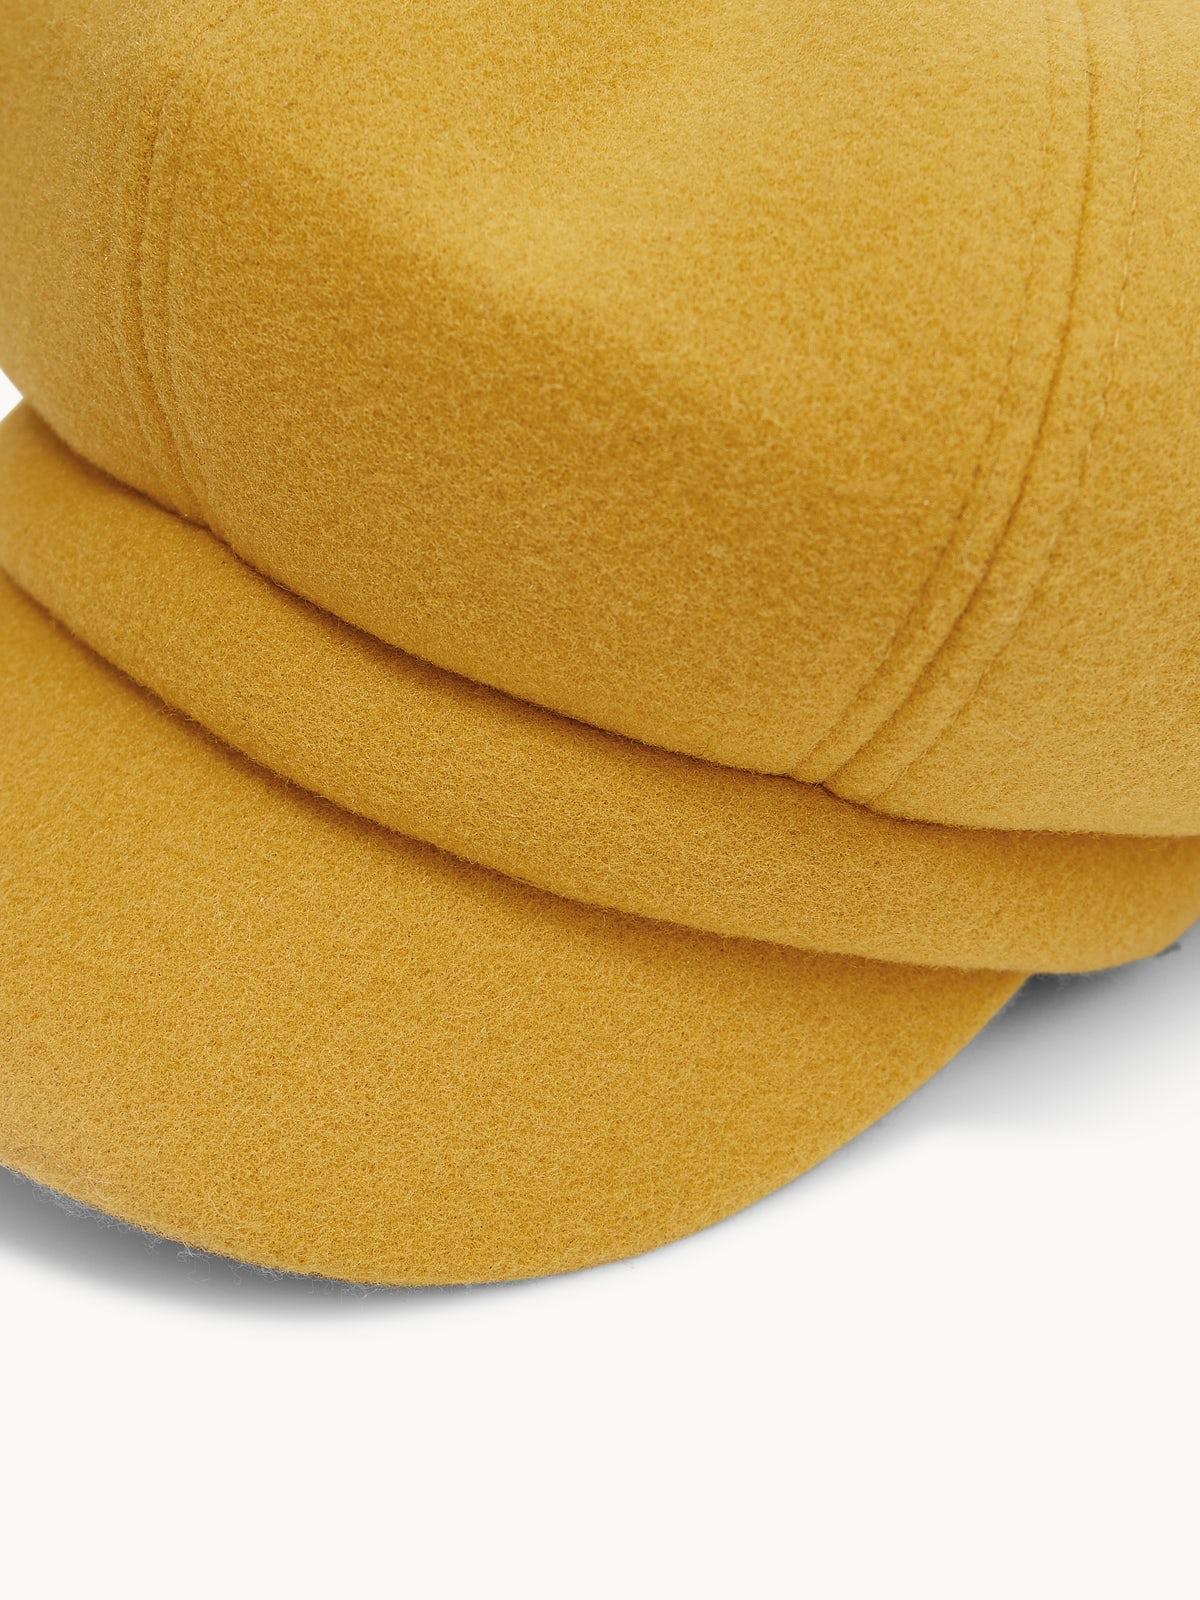 35450341f5270 Price  390 ฿  Name  Flat Cap - Yellow  icon